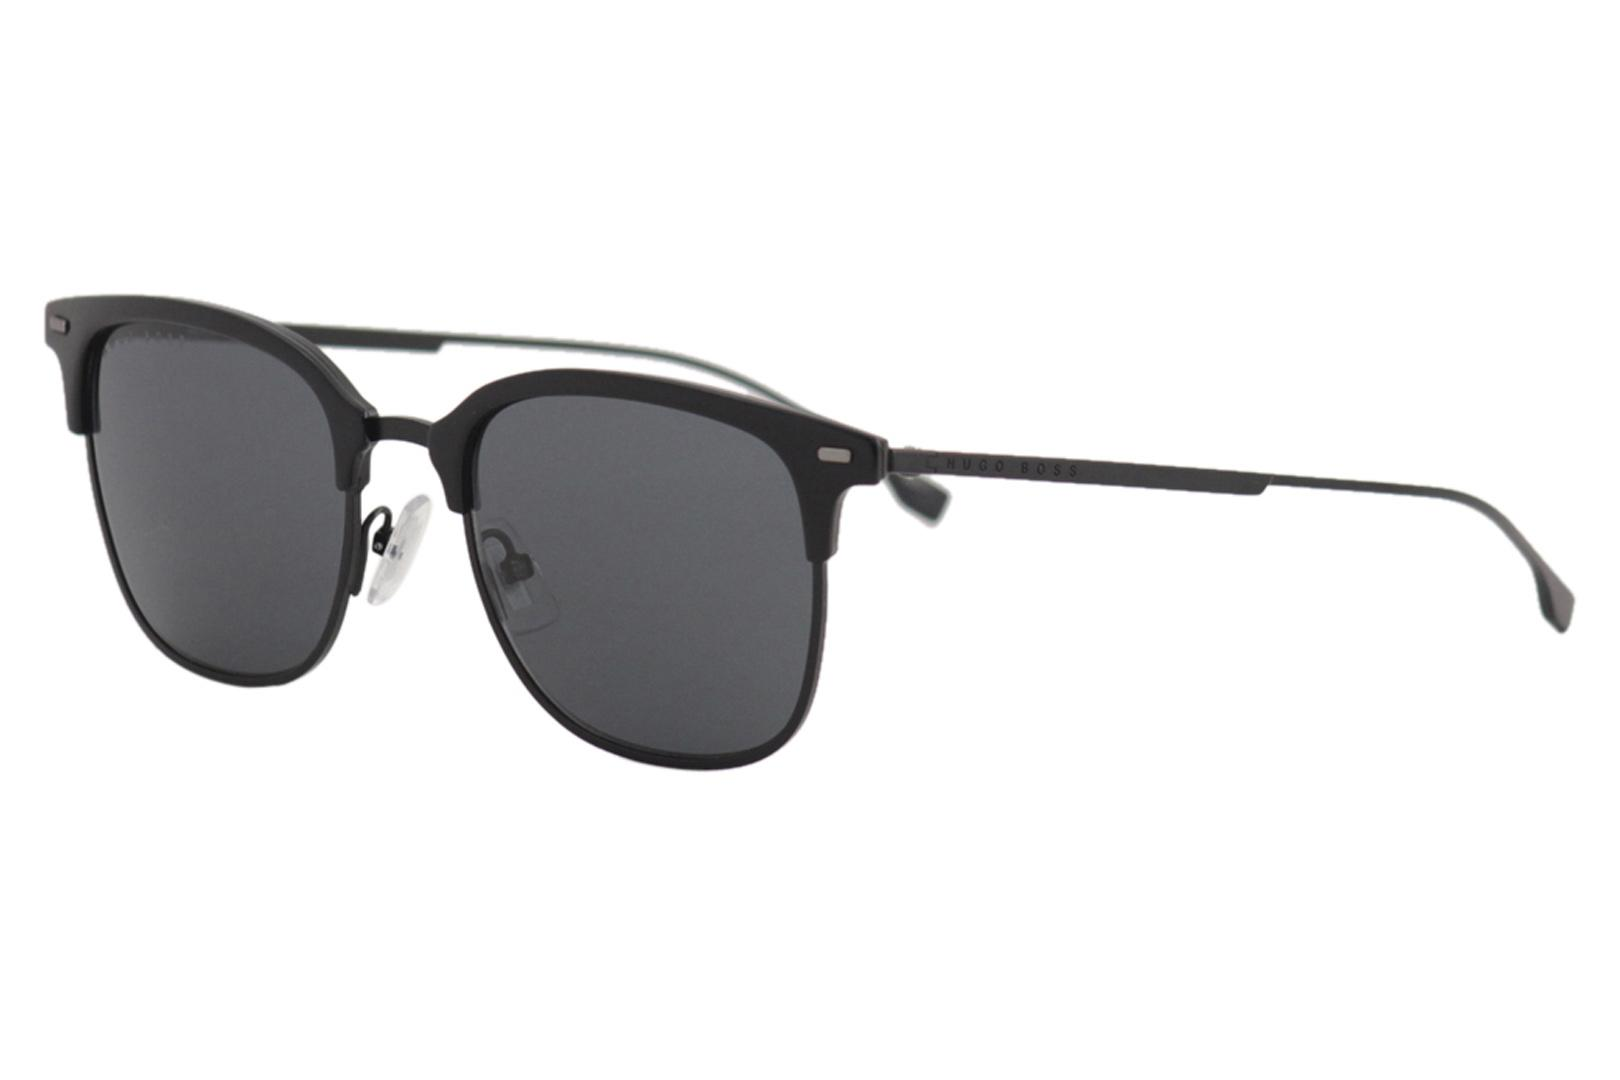 6ad9627d27b4 Hugo Boss Men's 1028FS 1028/F/S Fashion Square Titanium Sunglasses by Hugo  Boss